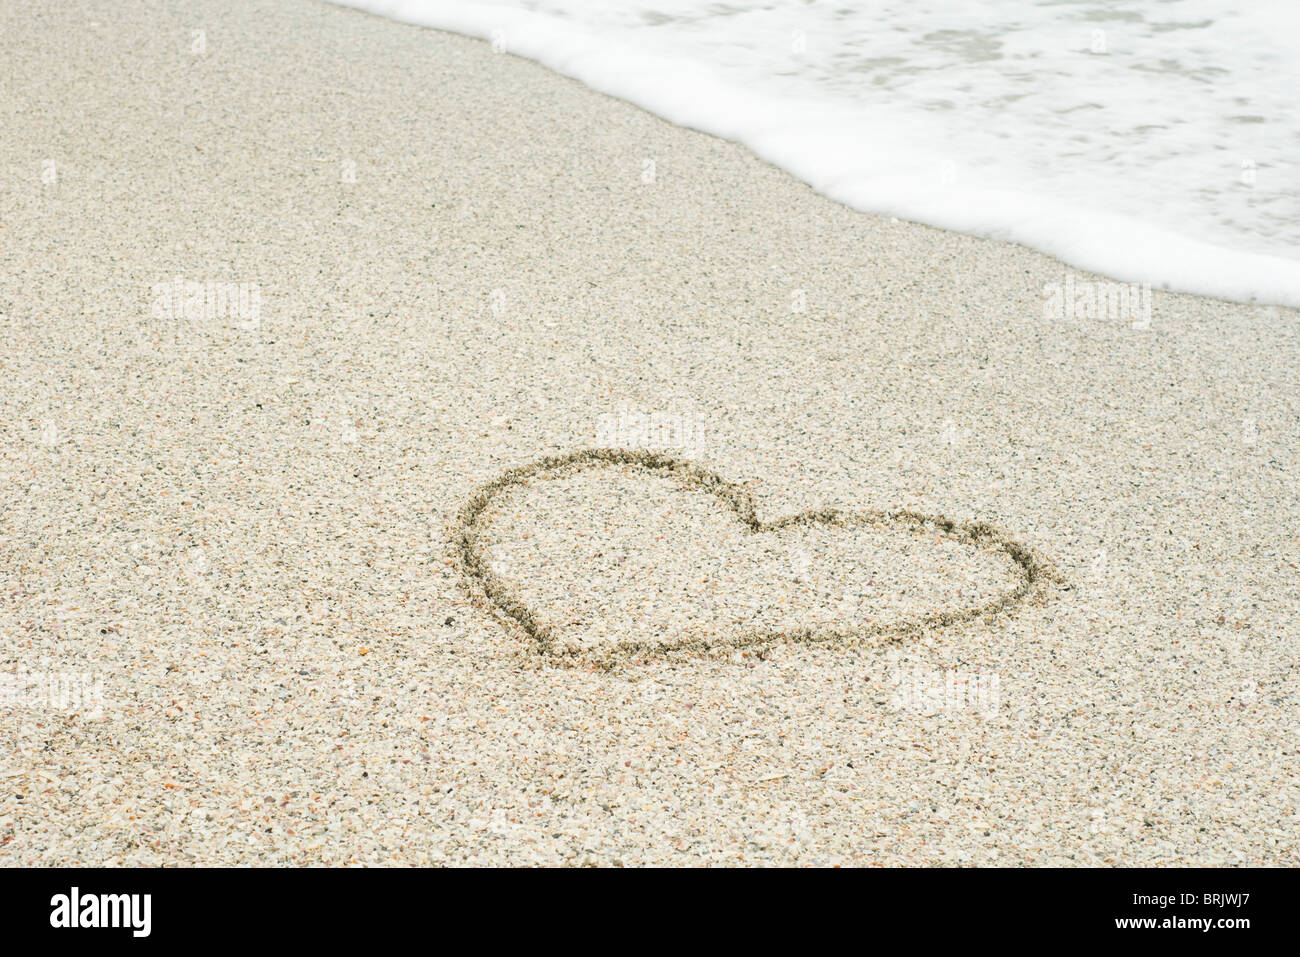 Herz im Sand am Strand gezogen Stockbild